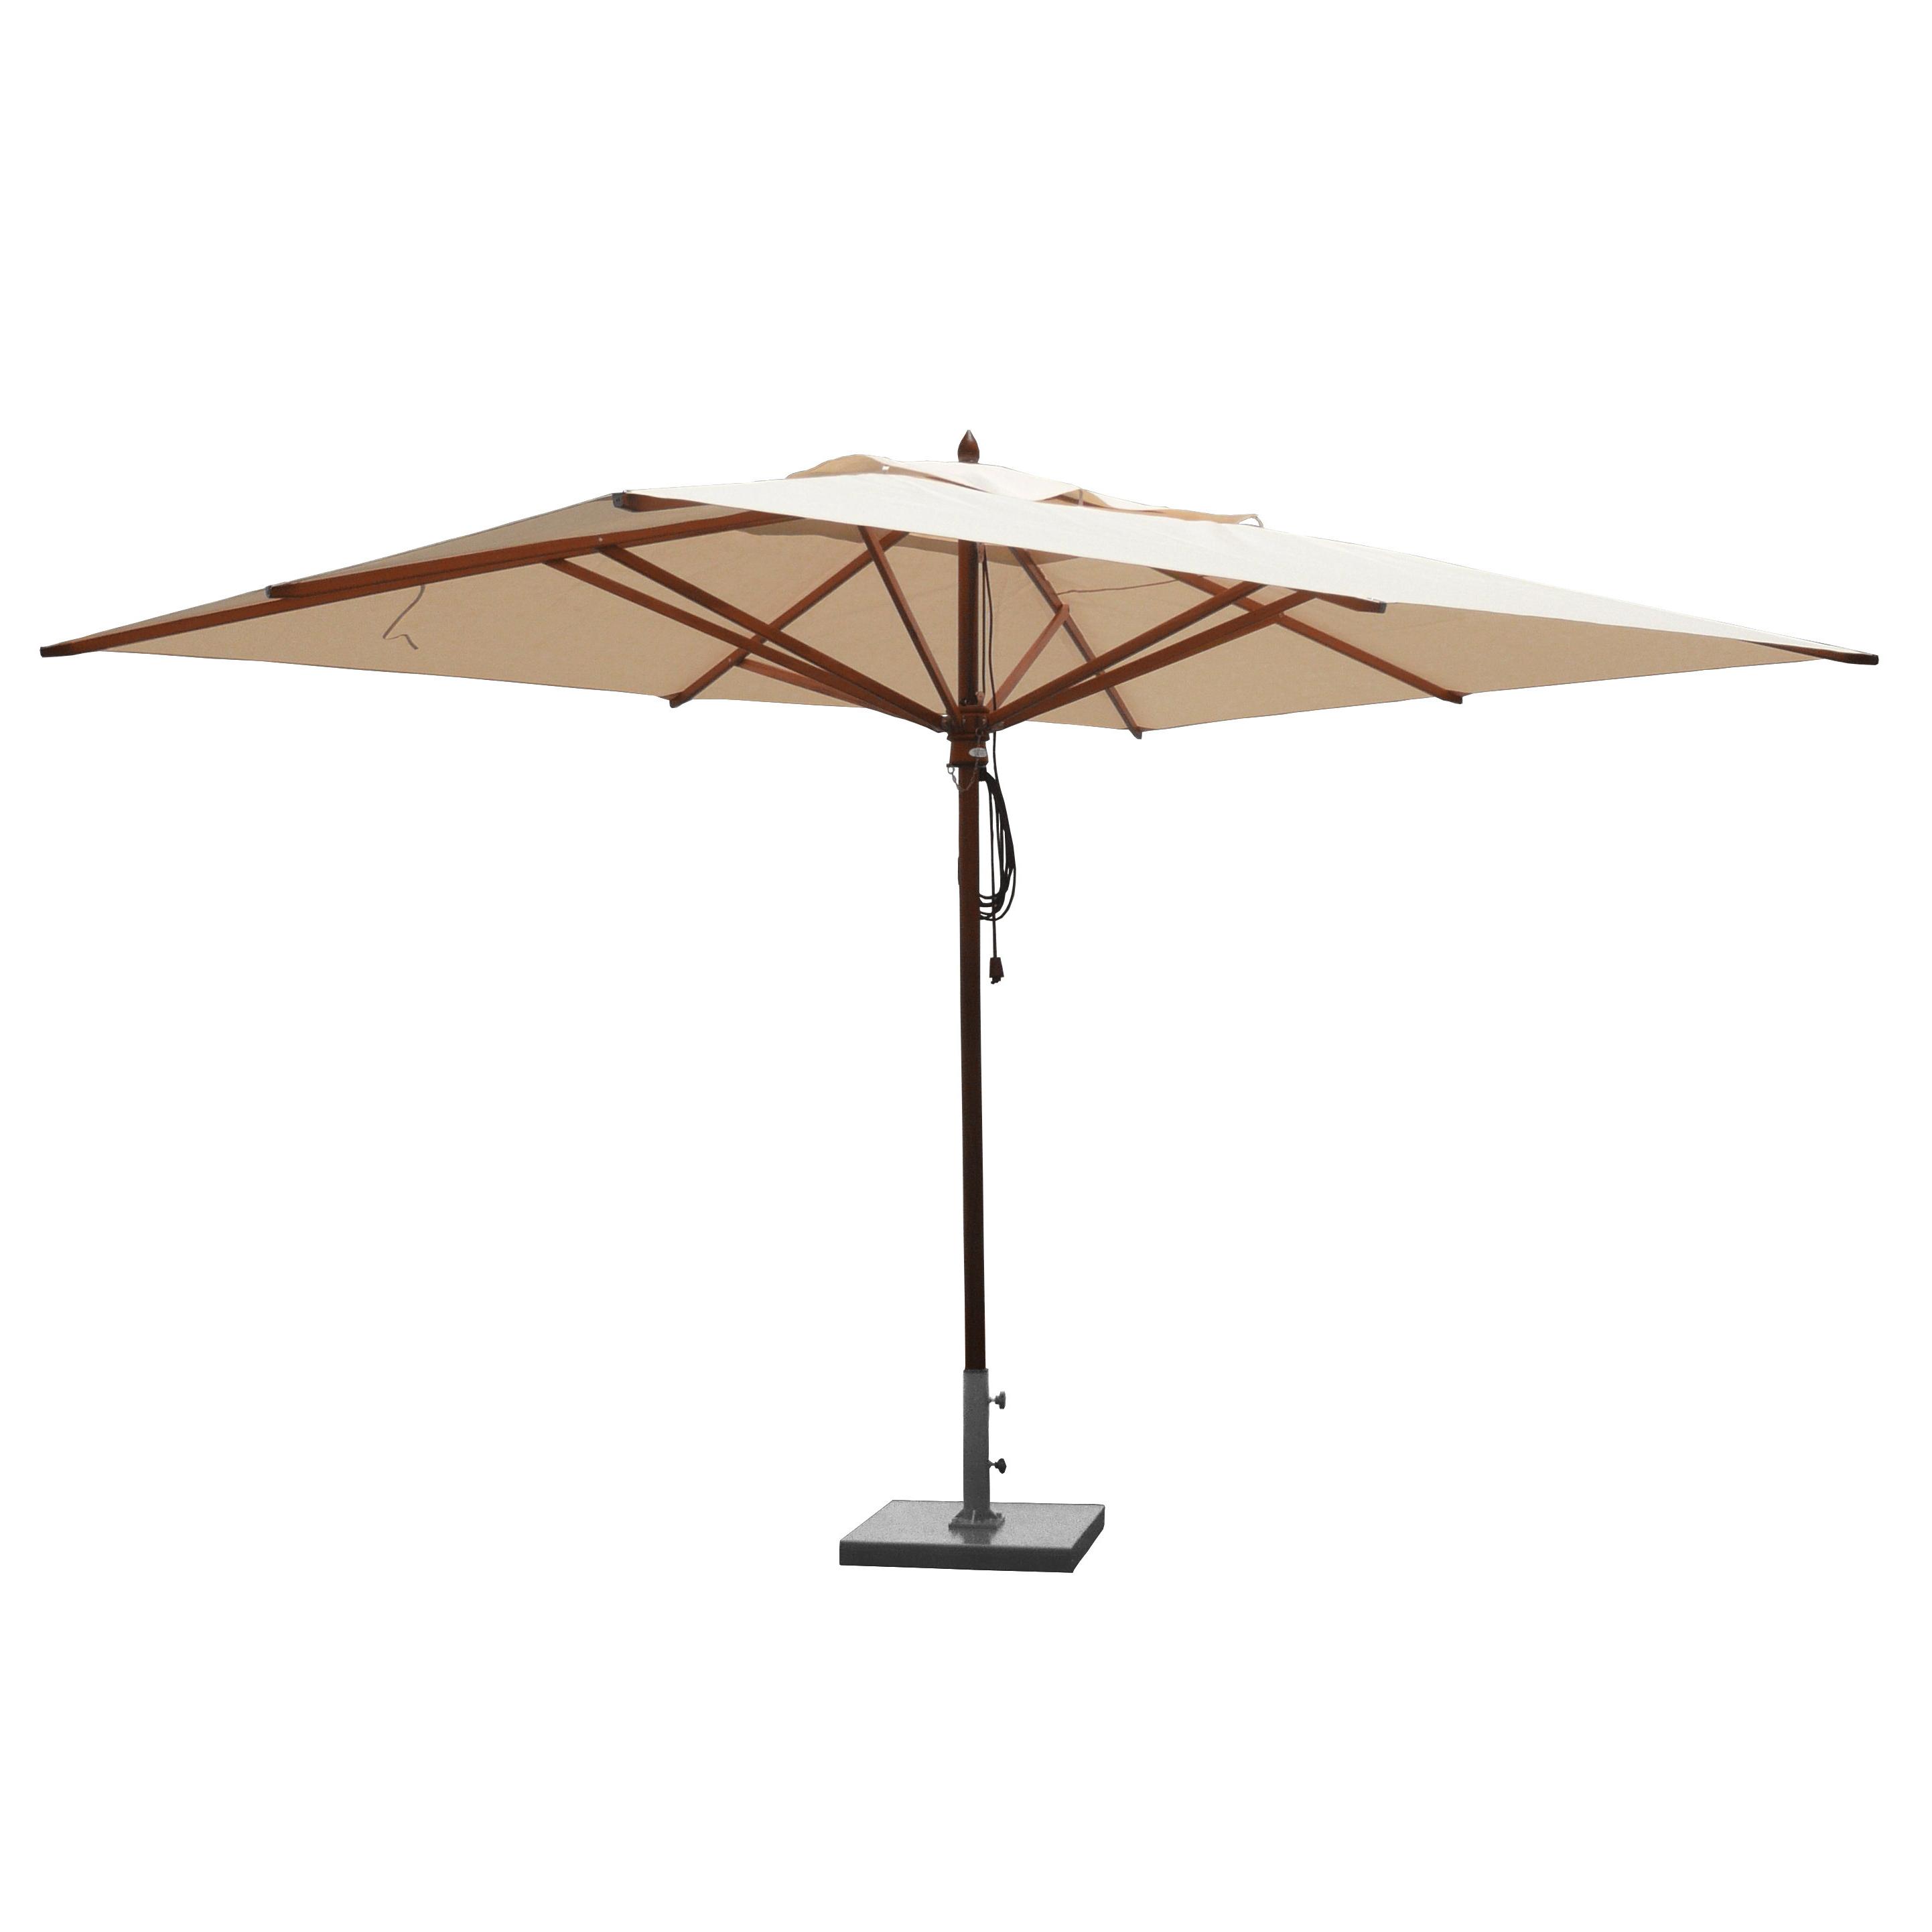 Eisele Rectangular Market Umbrellas With Regard To Best And Newest Sherbourne 10' X 13' Rectangular Market Umbrella (Gallery 17 of 20)